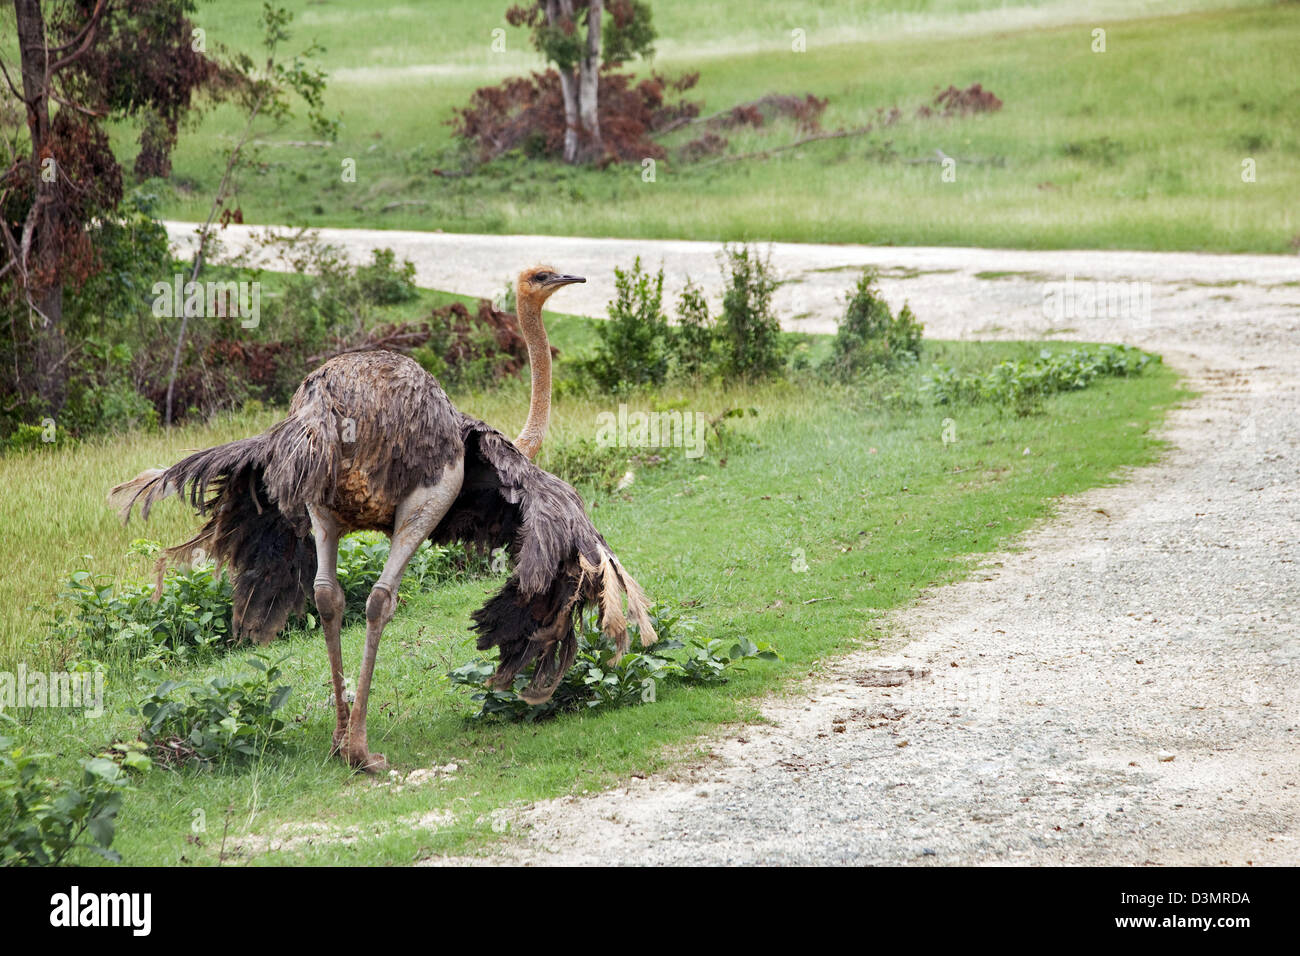 Common Ostrich (Struthio camelus) female on the island Cayo Saetia / Cayo Sae-Tia, Cuba, Caribbean Stock Photo